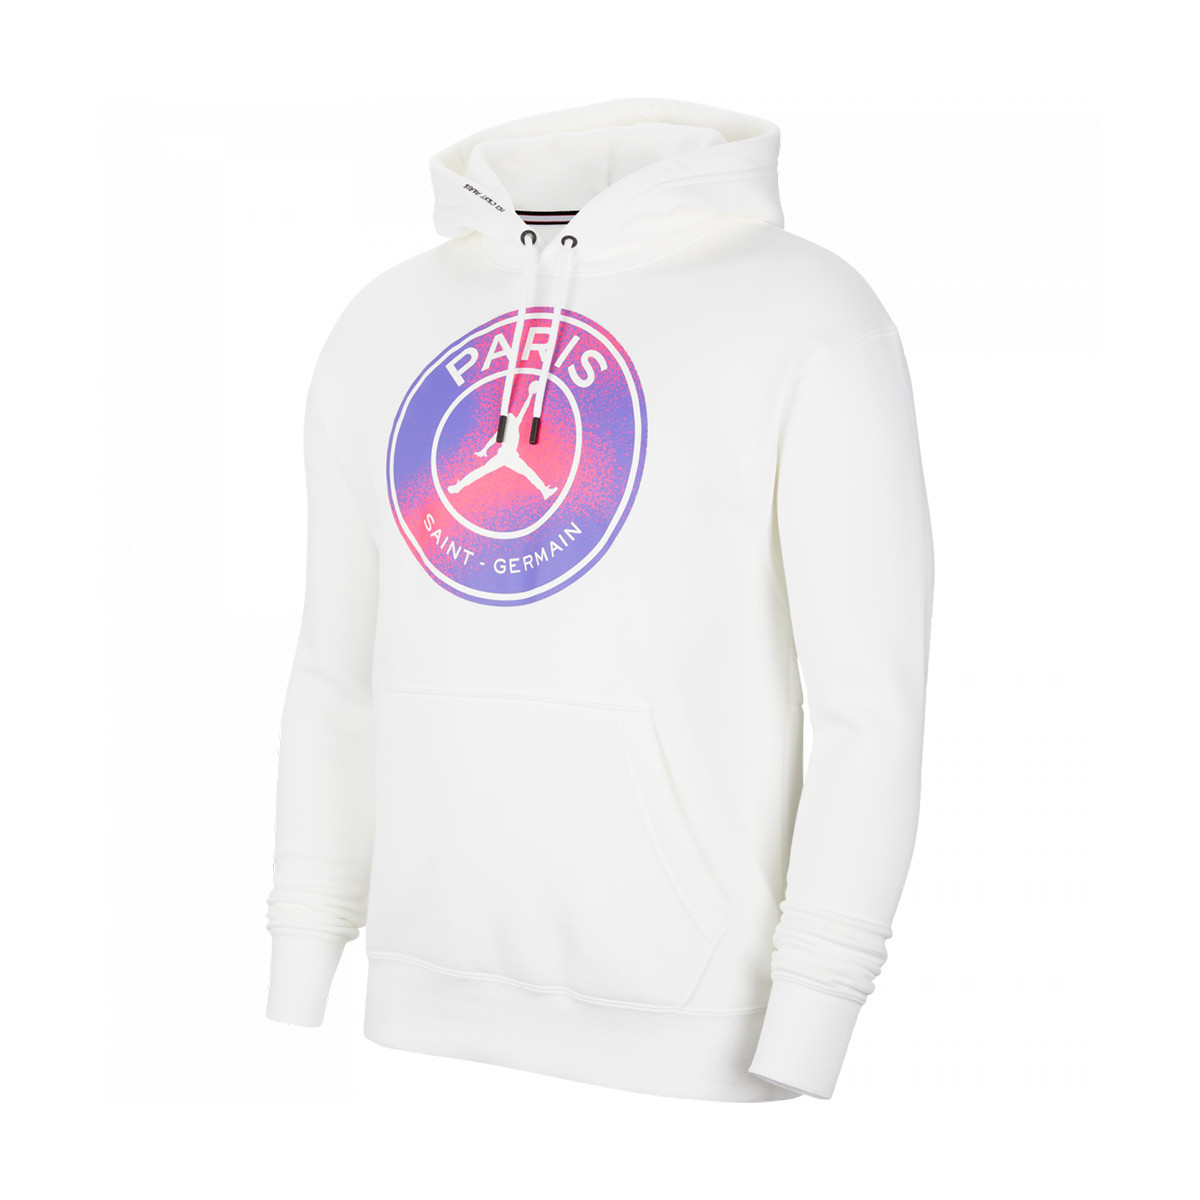 nike jordan x paris saint germain fleece pullover 2020 2021 sweatshirt